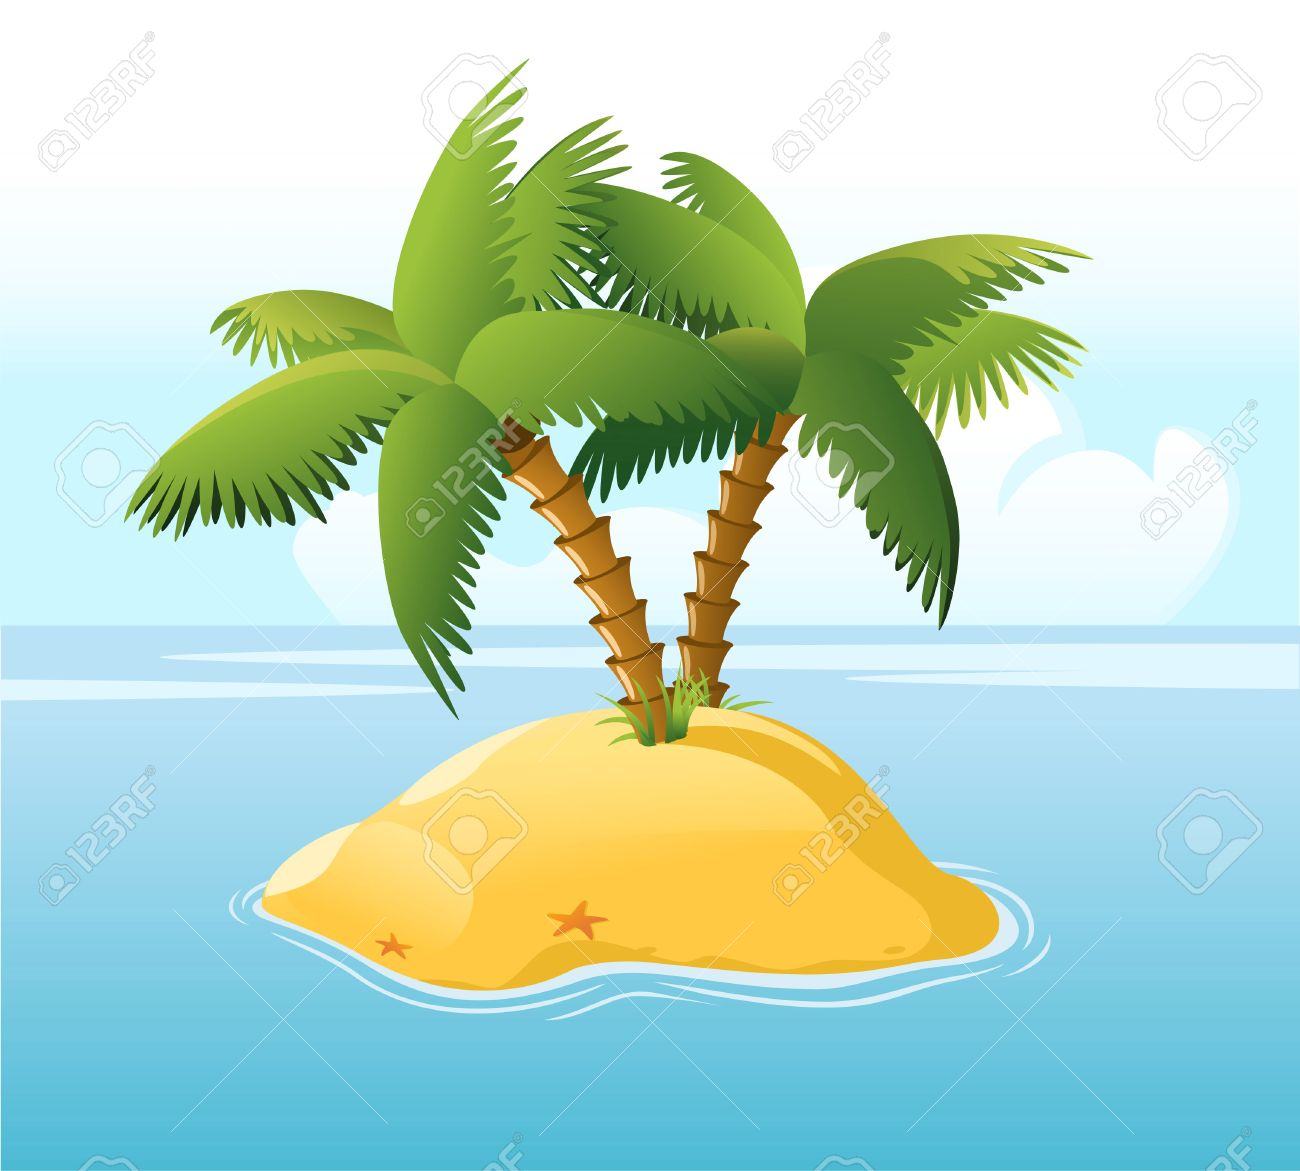 Cartoon Palm Tree Island Desert Island With Palm Trees